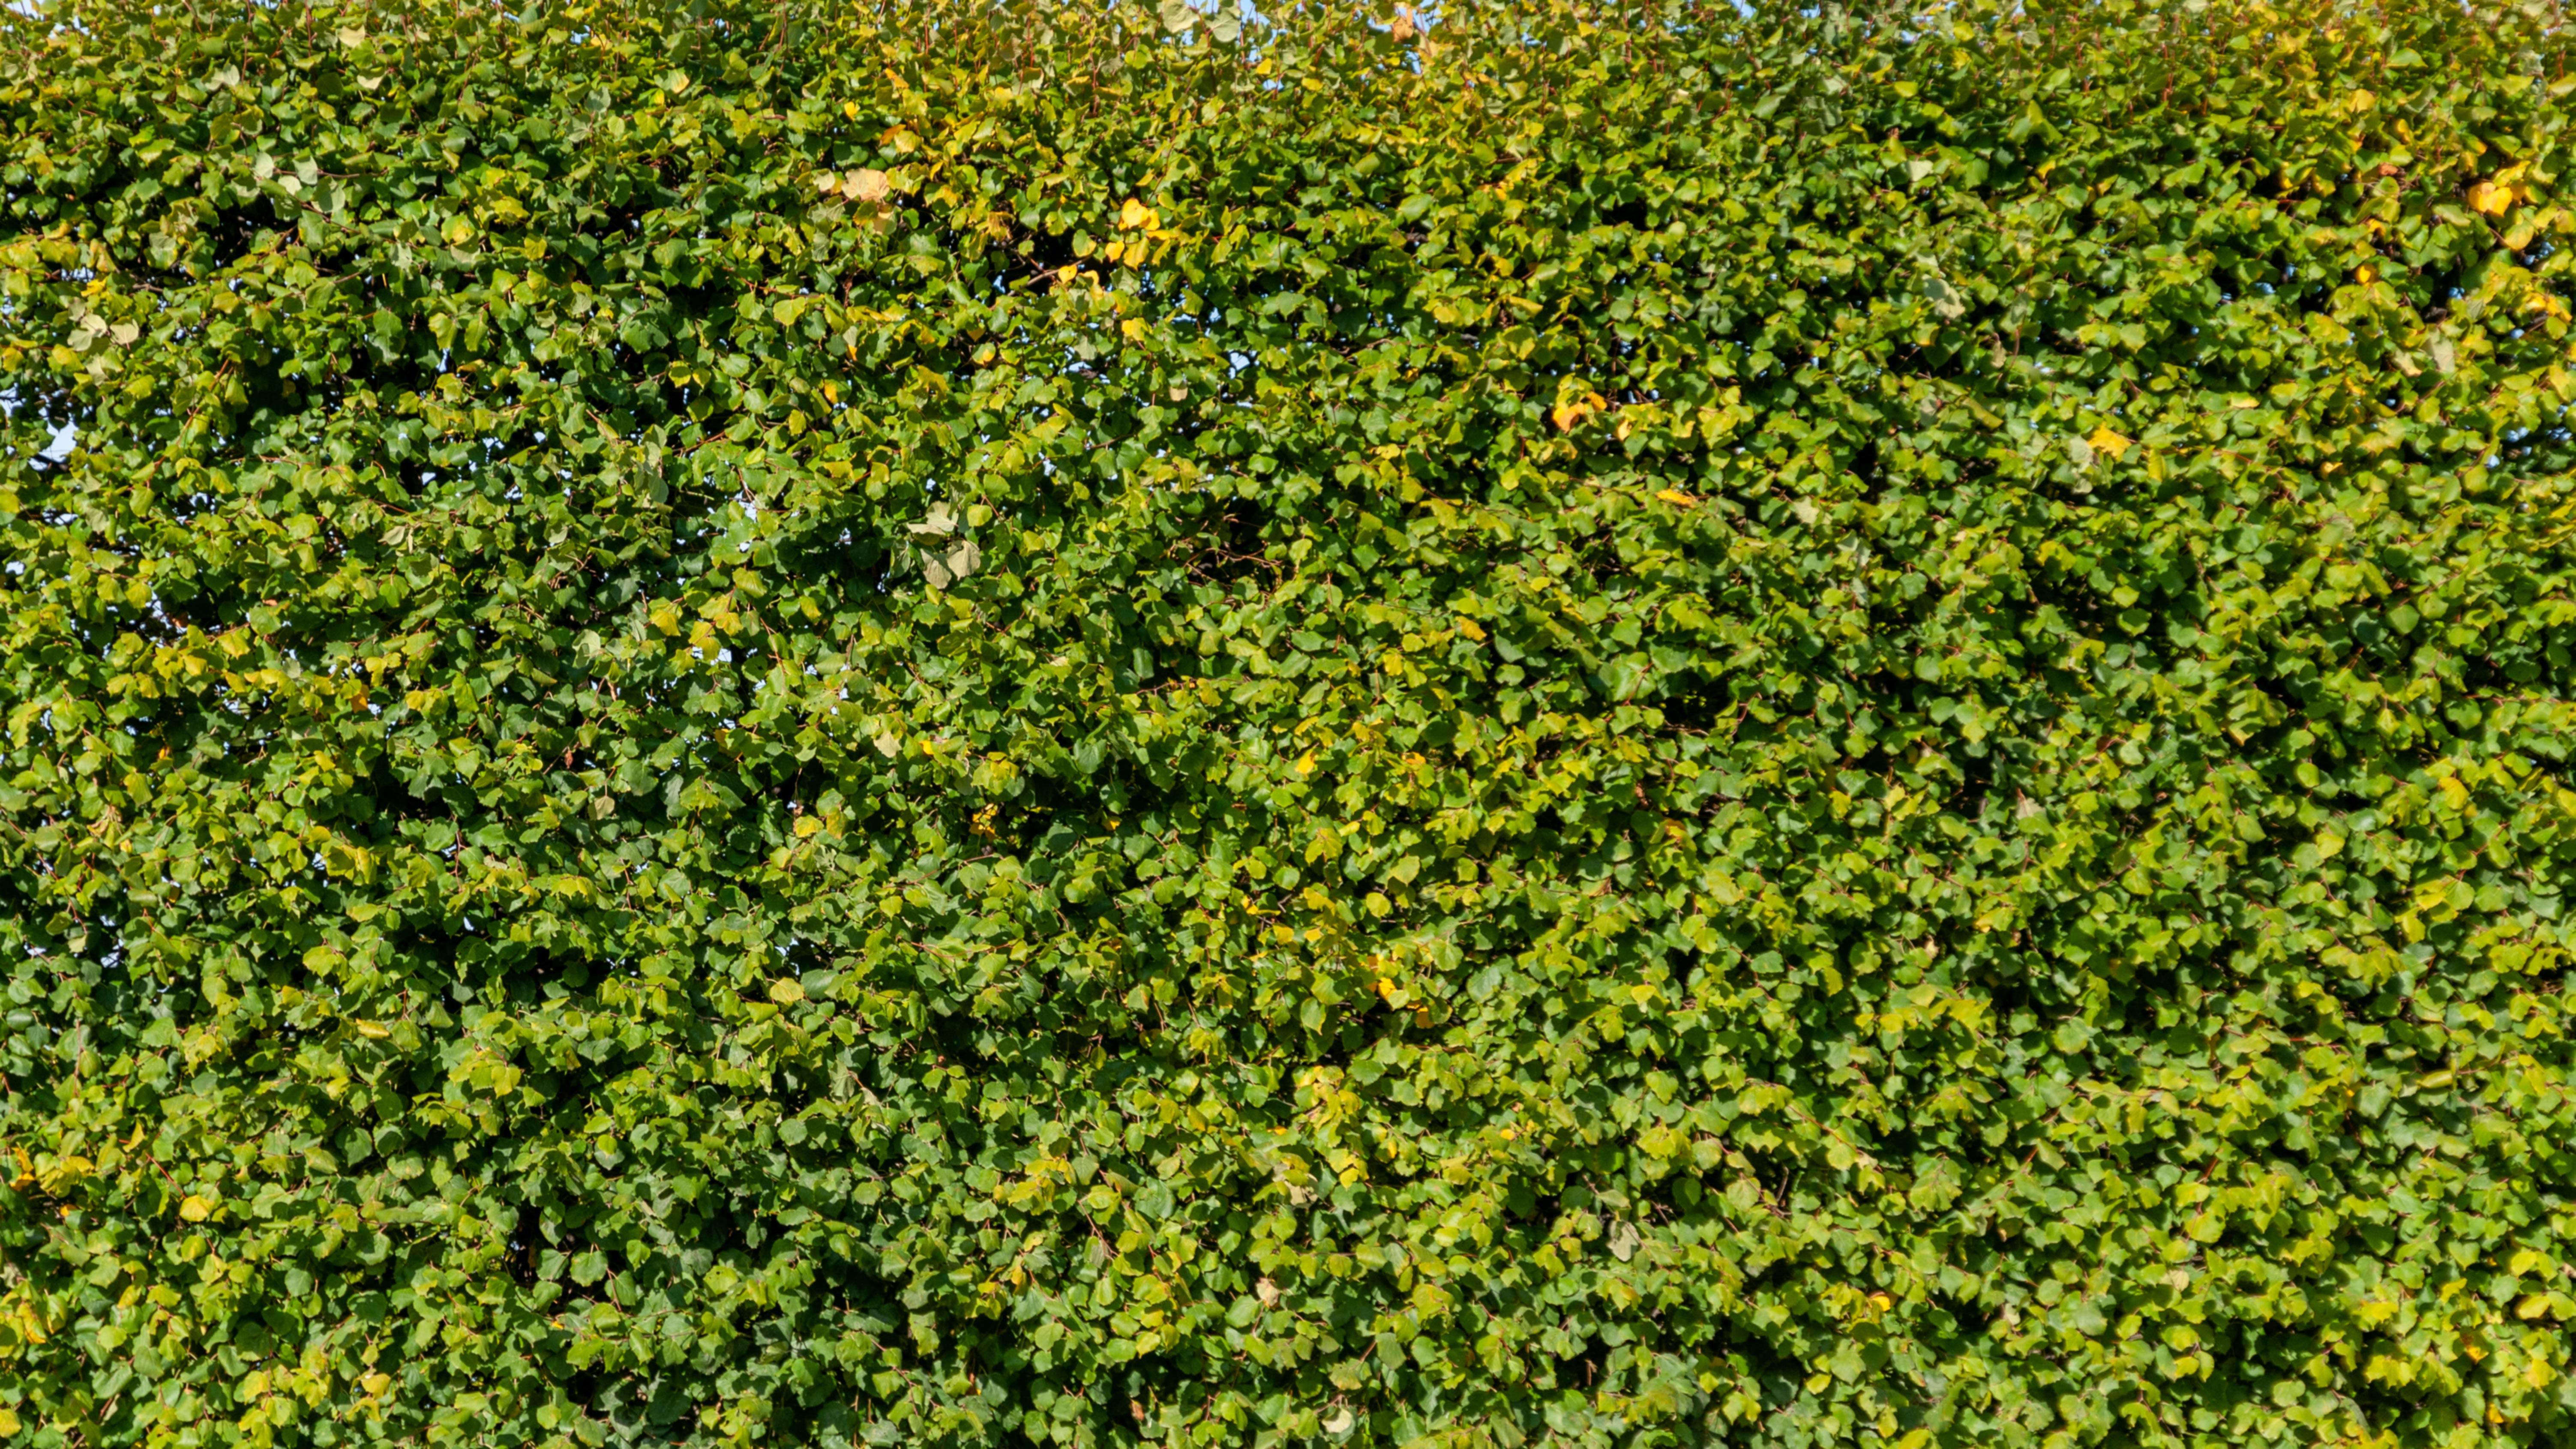 Garden bush background wall